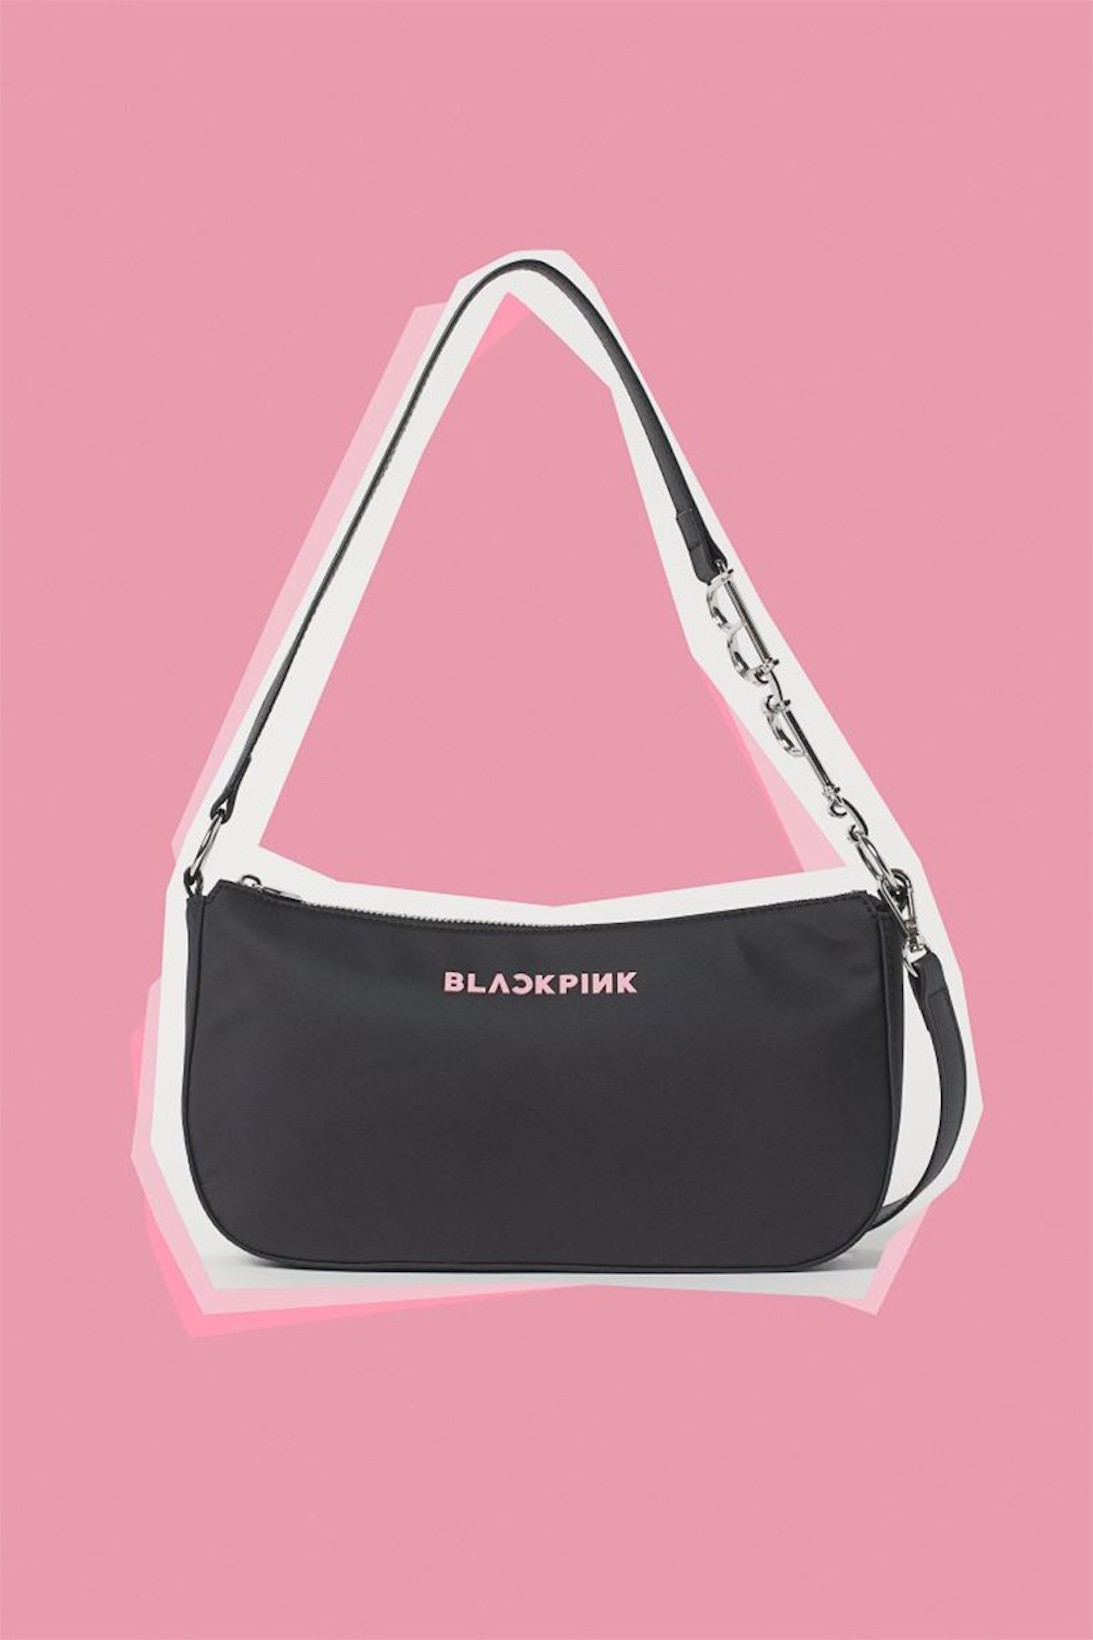 blackpink h&m collabration 2021 korea items where when release